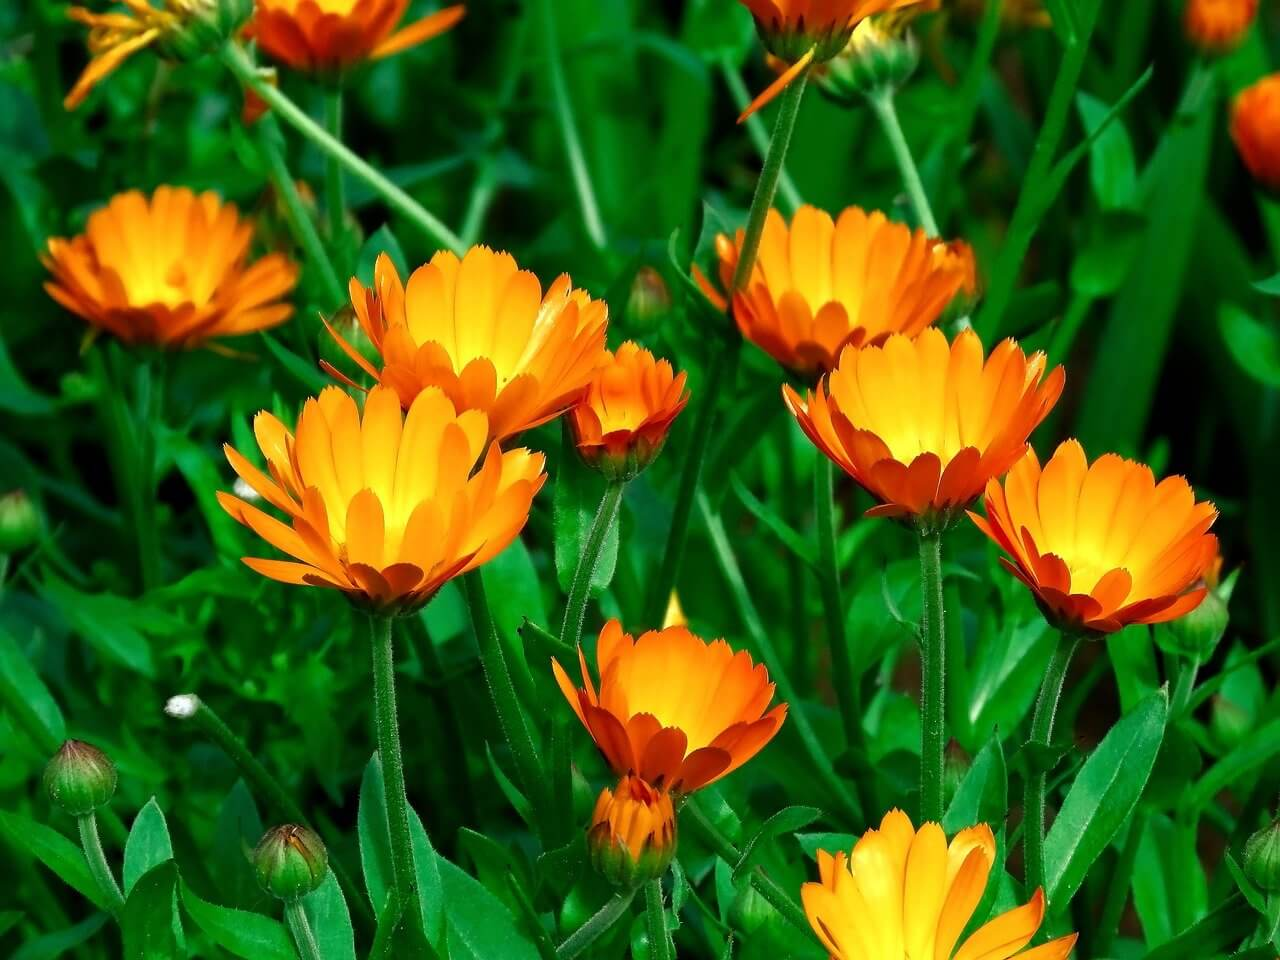 A körömvirág (Calendula officinalis) gyógynövény